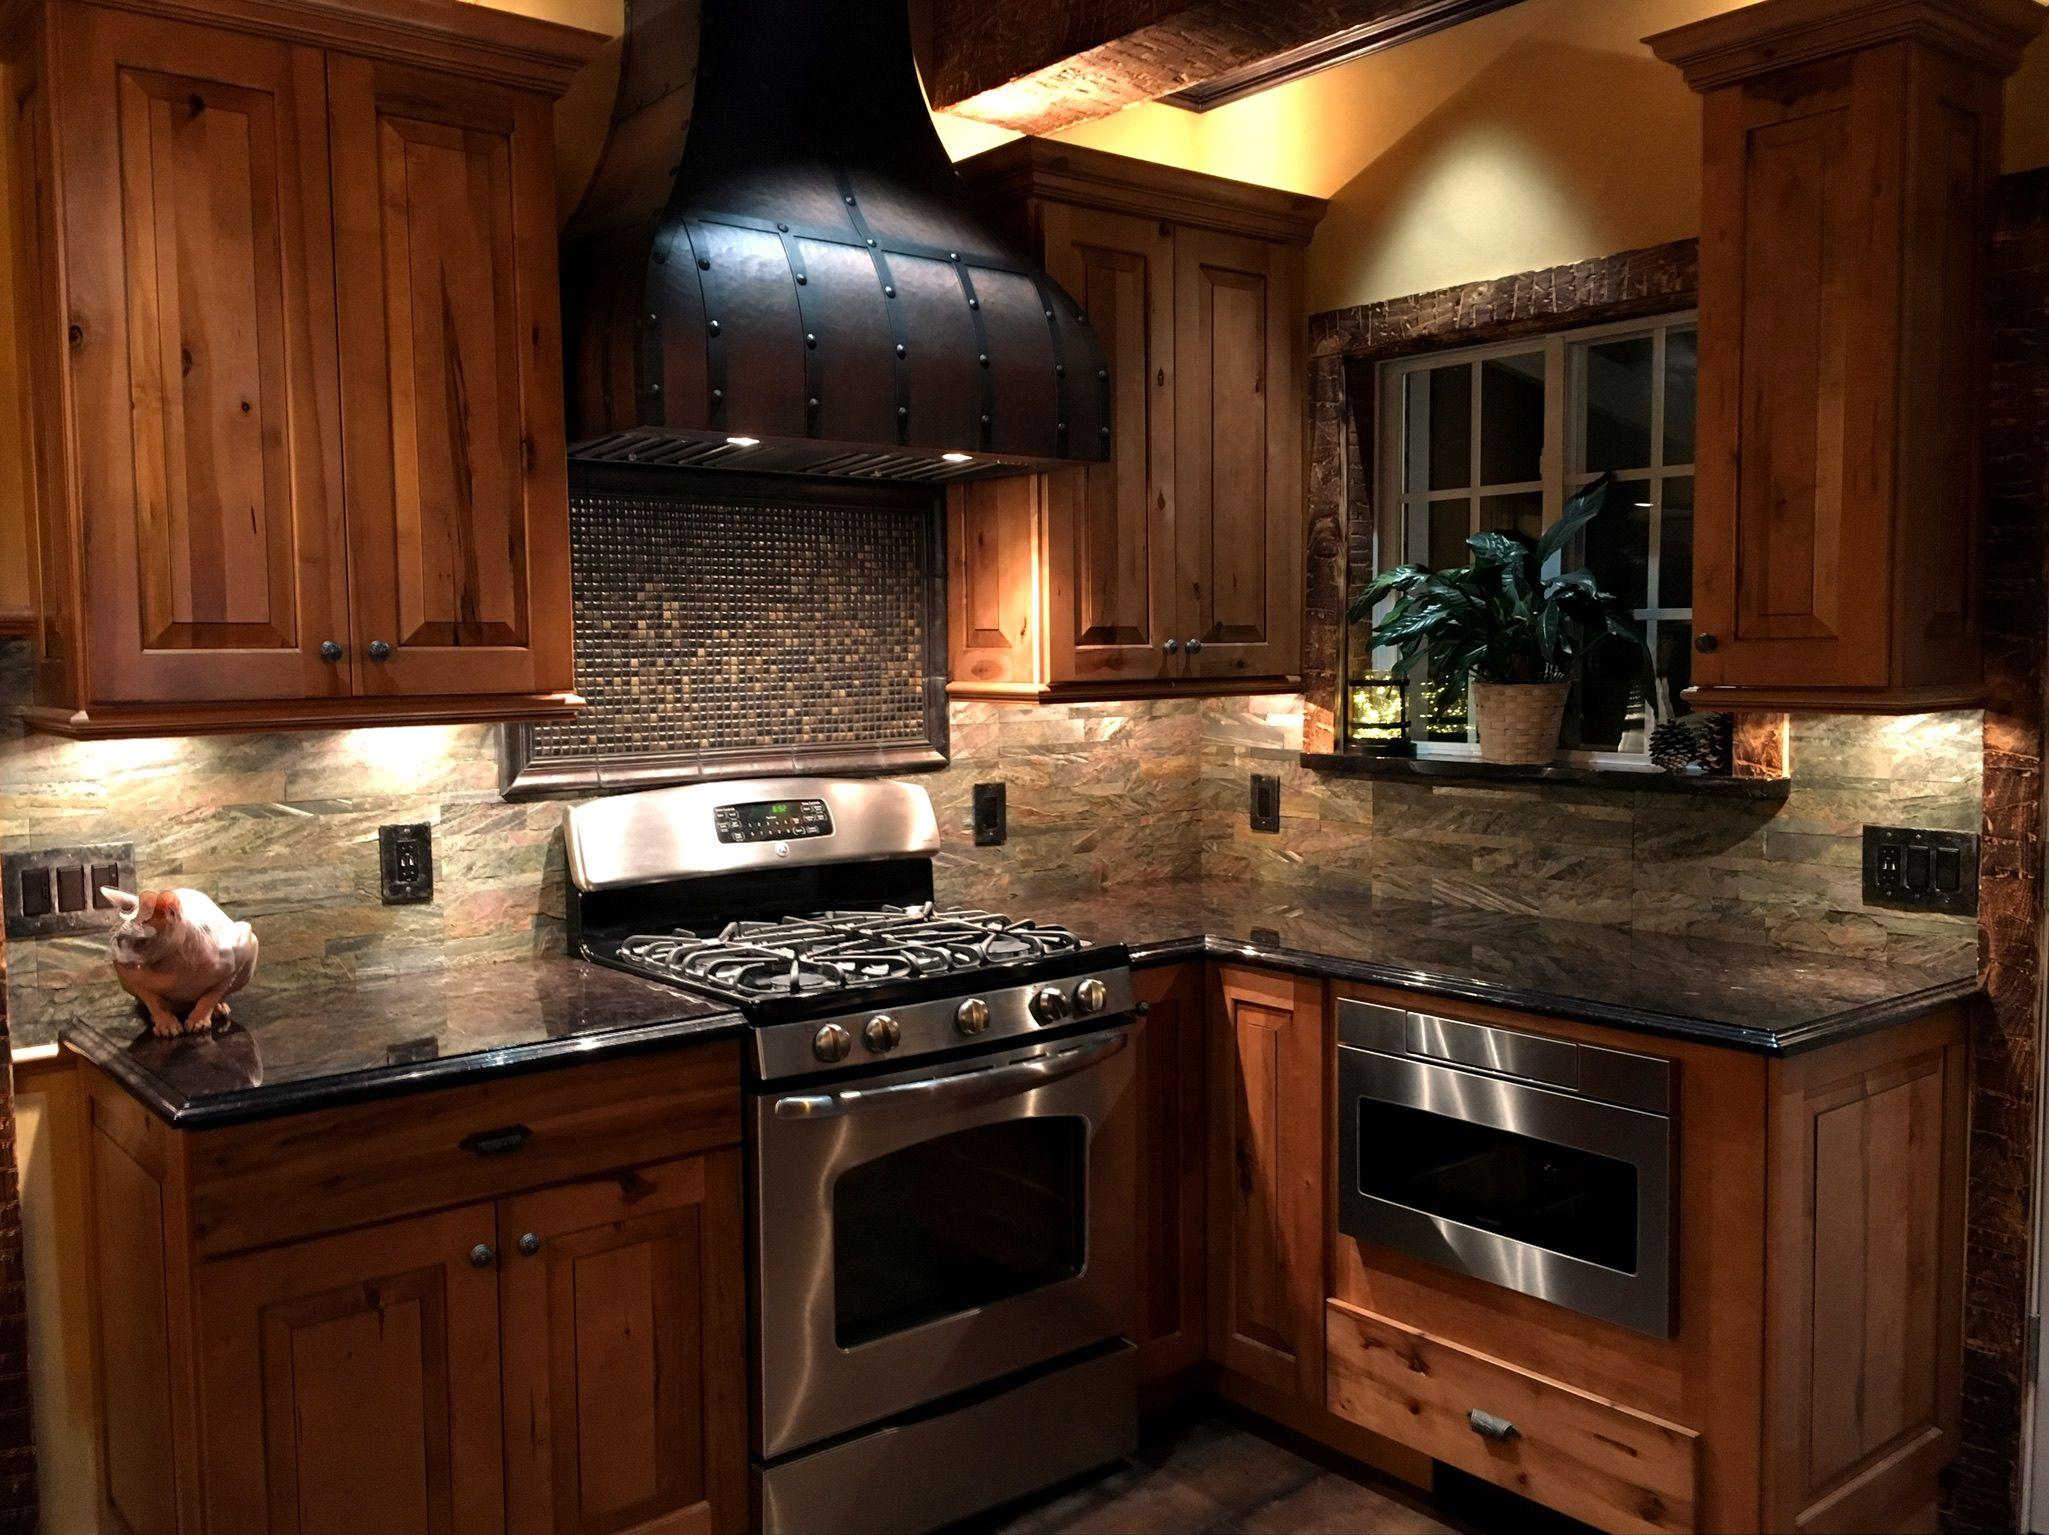 Großartig Shaker Küchenschranktüren Weiß Ideen - Küchen Design Ideen ...